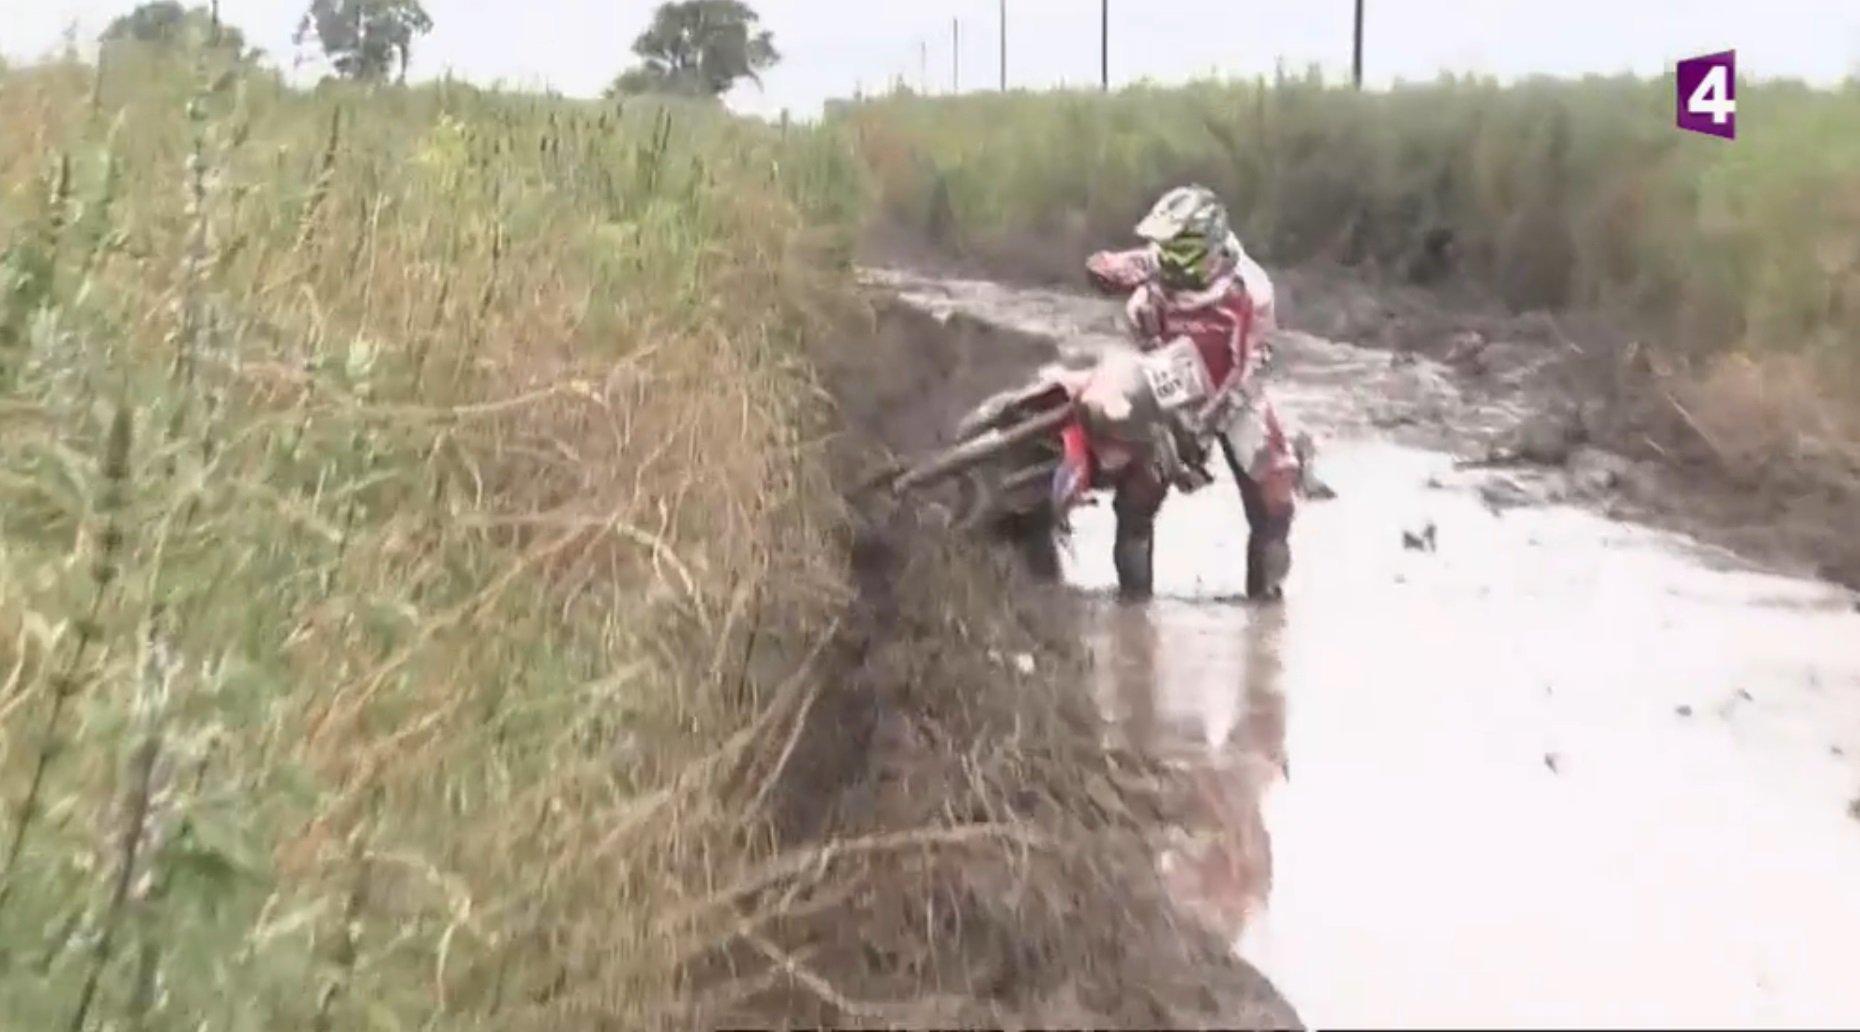 2016 Rallye Raid Dakar Argentina - Bolivia [3-16 Enero] - Página 6 CX5ZQ99WMAEHGNR